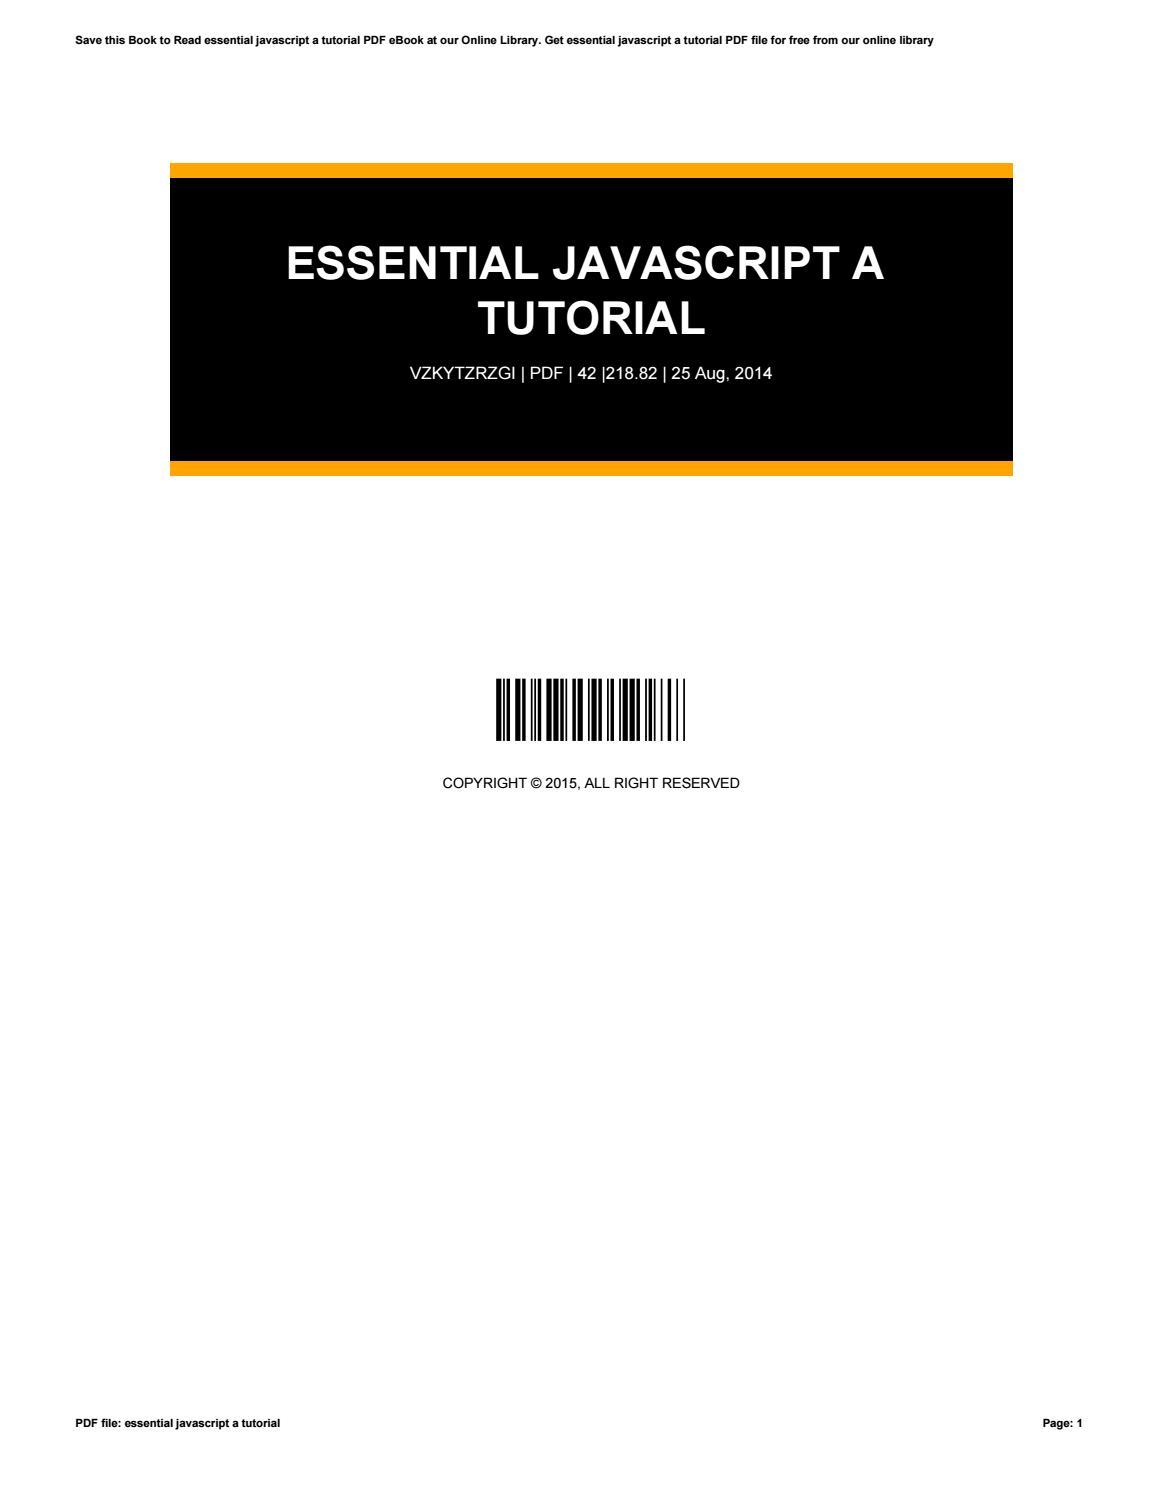 essential javascript a tutorial by denise paulson - issuu